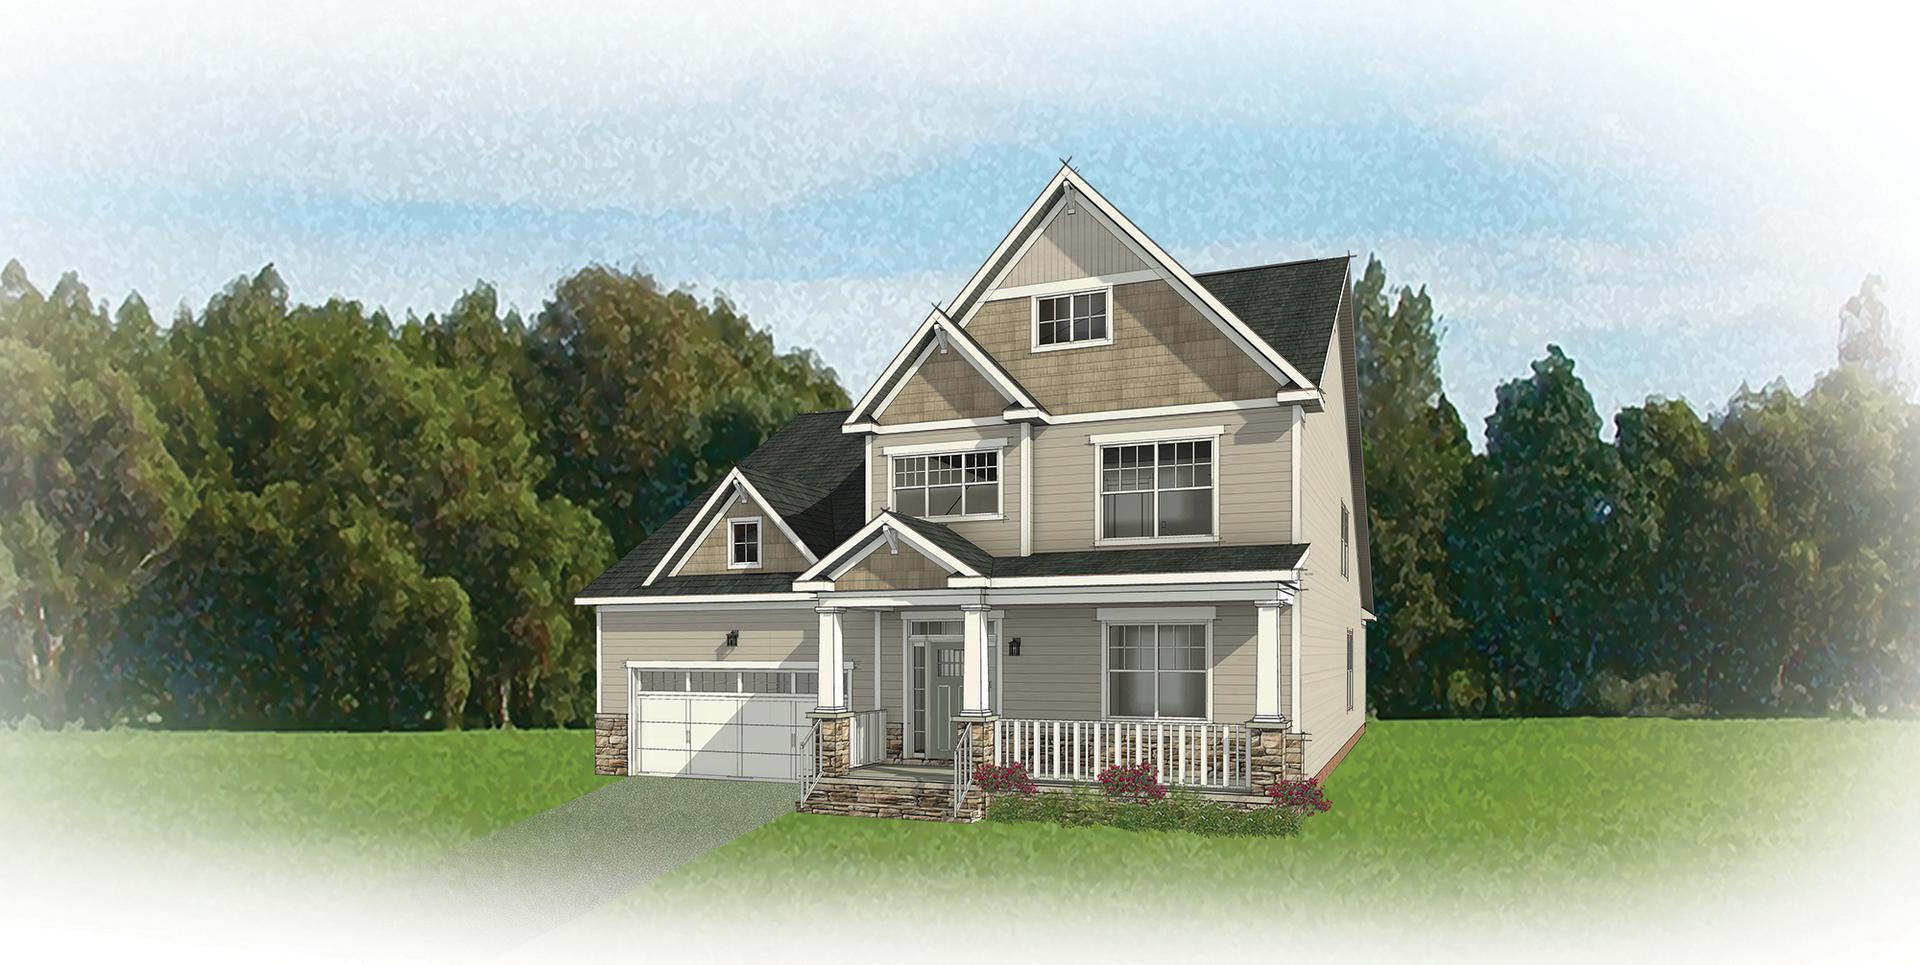 12317 Beech Hall Circle, Manakin-Sabot, VA 23103 Home for Sale